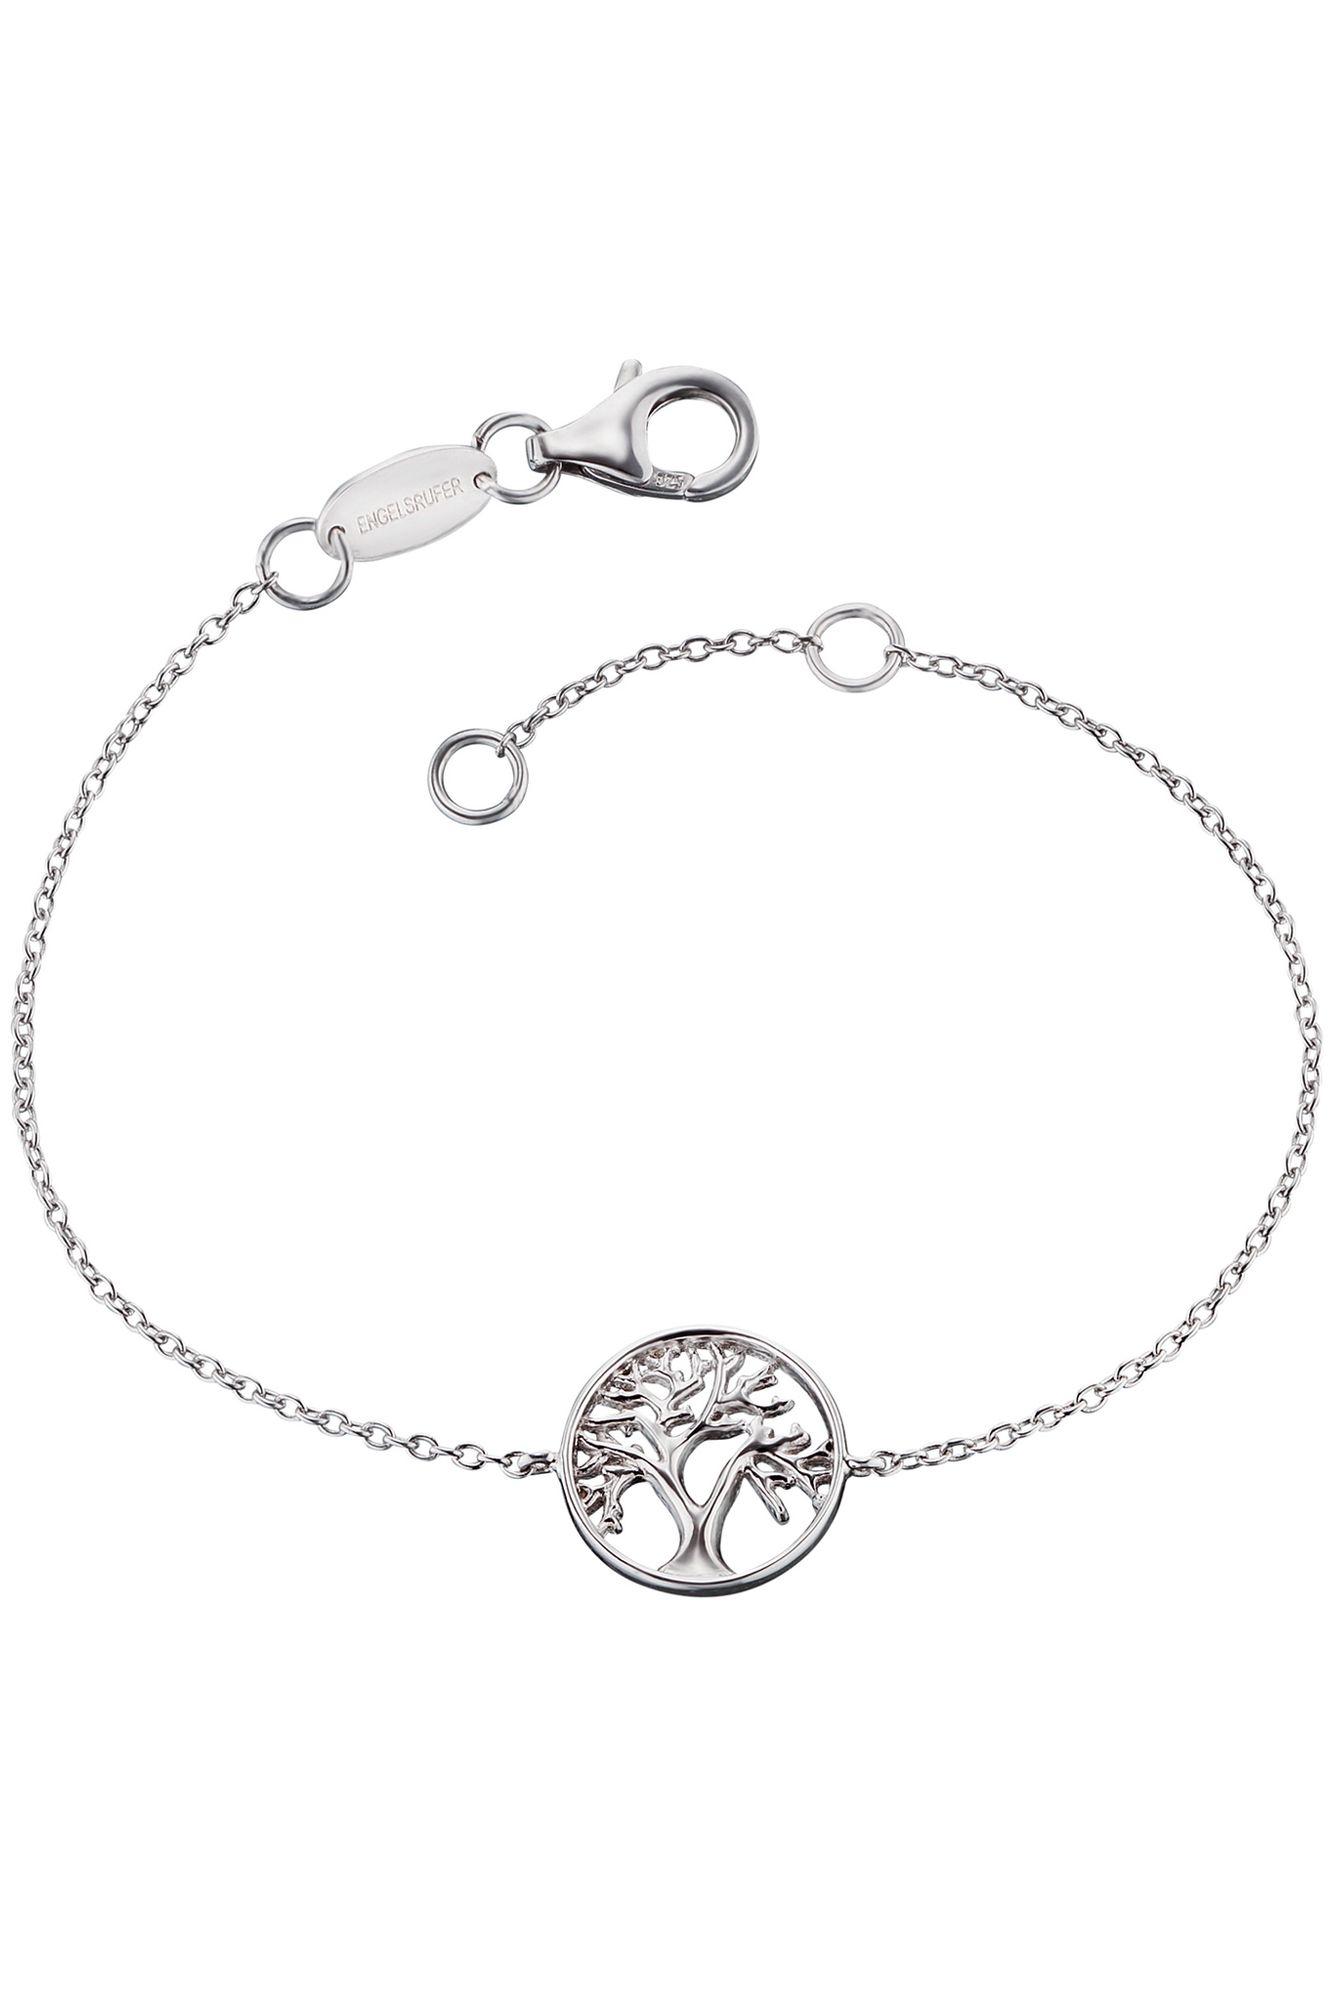 Engelsrufer ERB-LILTREE Damen Armband Lebensbaum Silber 19 cm